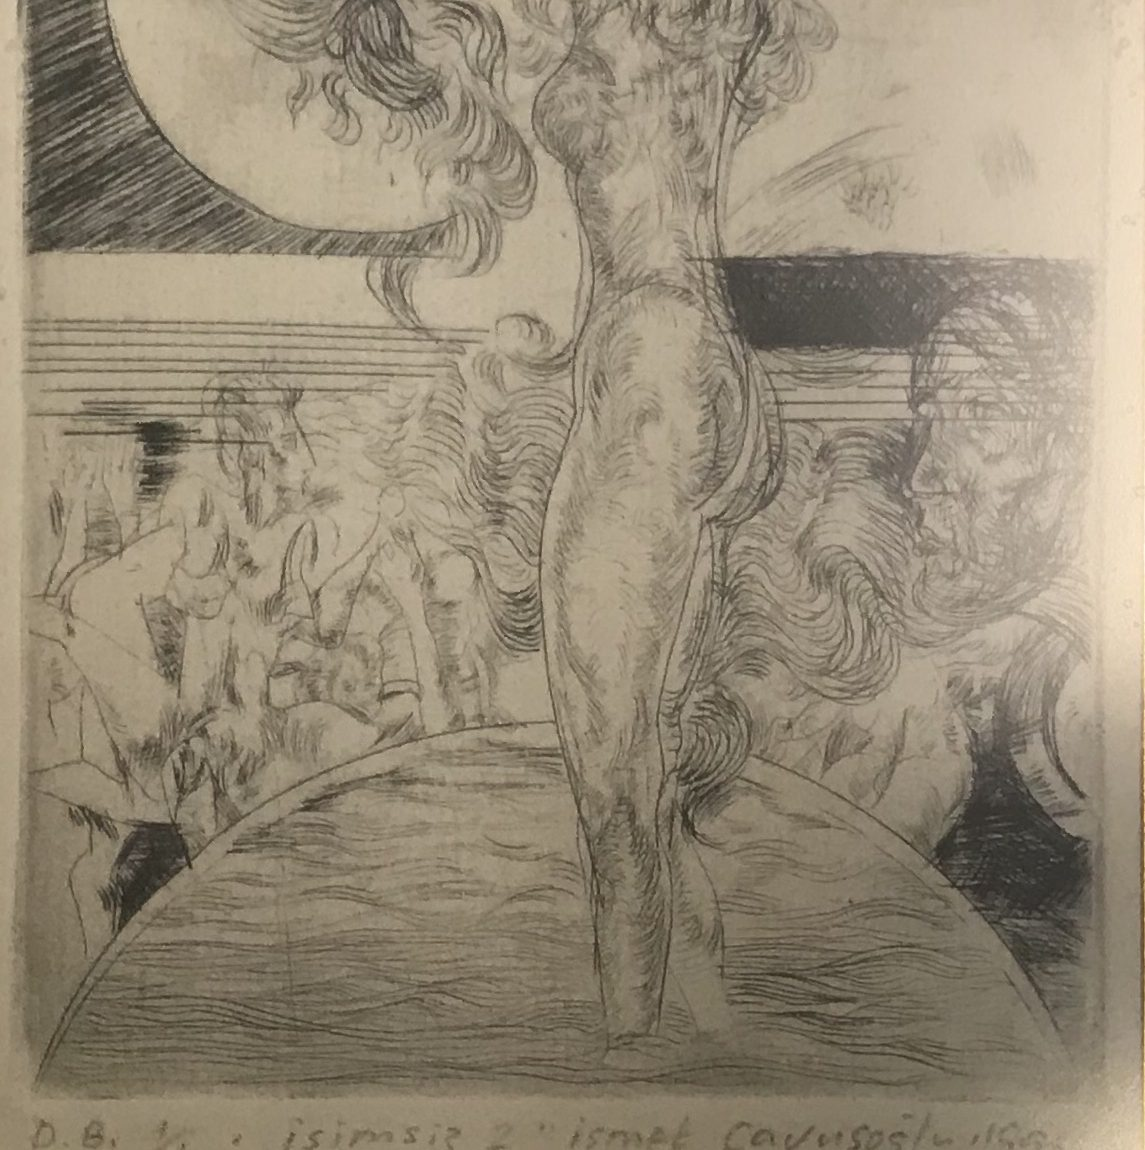 İsmet Çavuşoğlu  Teknik :Baskı  Ölçü : 12 x 16 cm  Fiyat : 885 TL